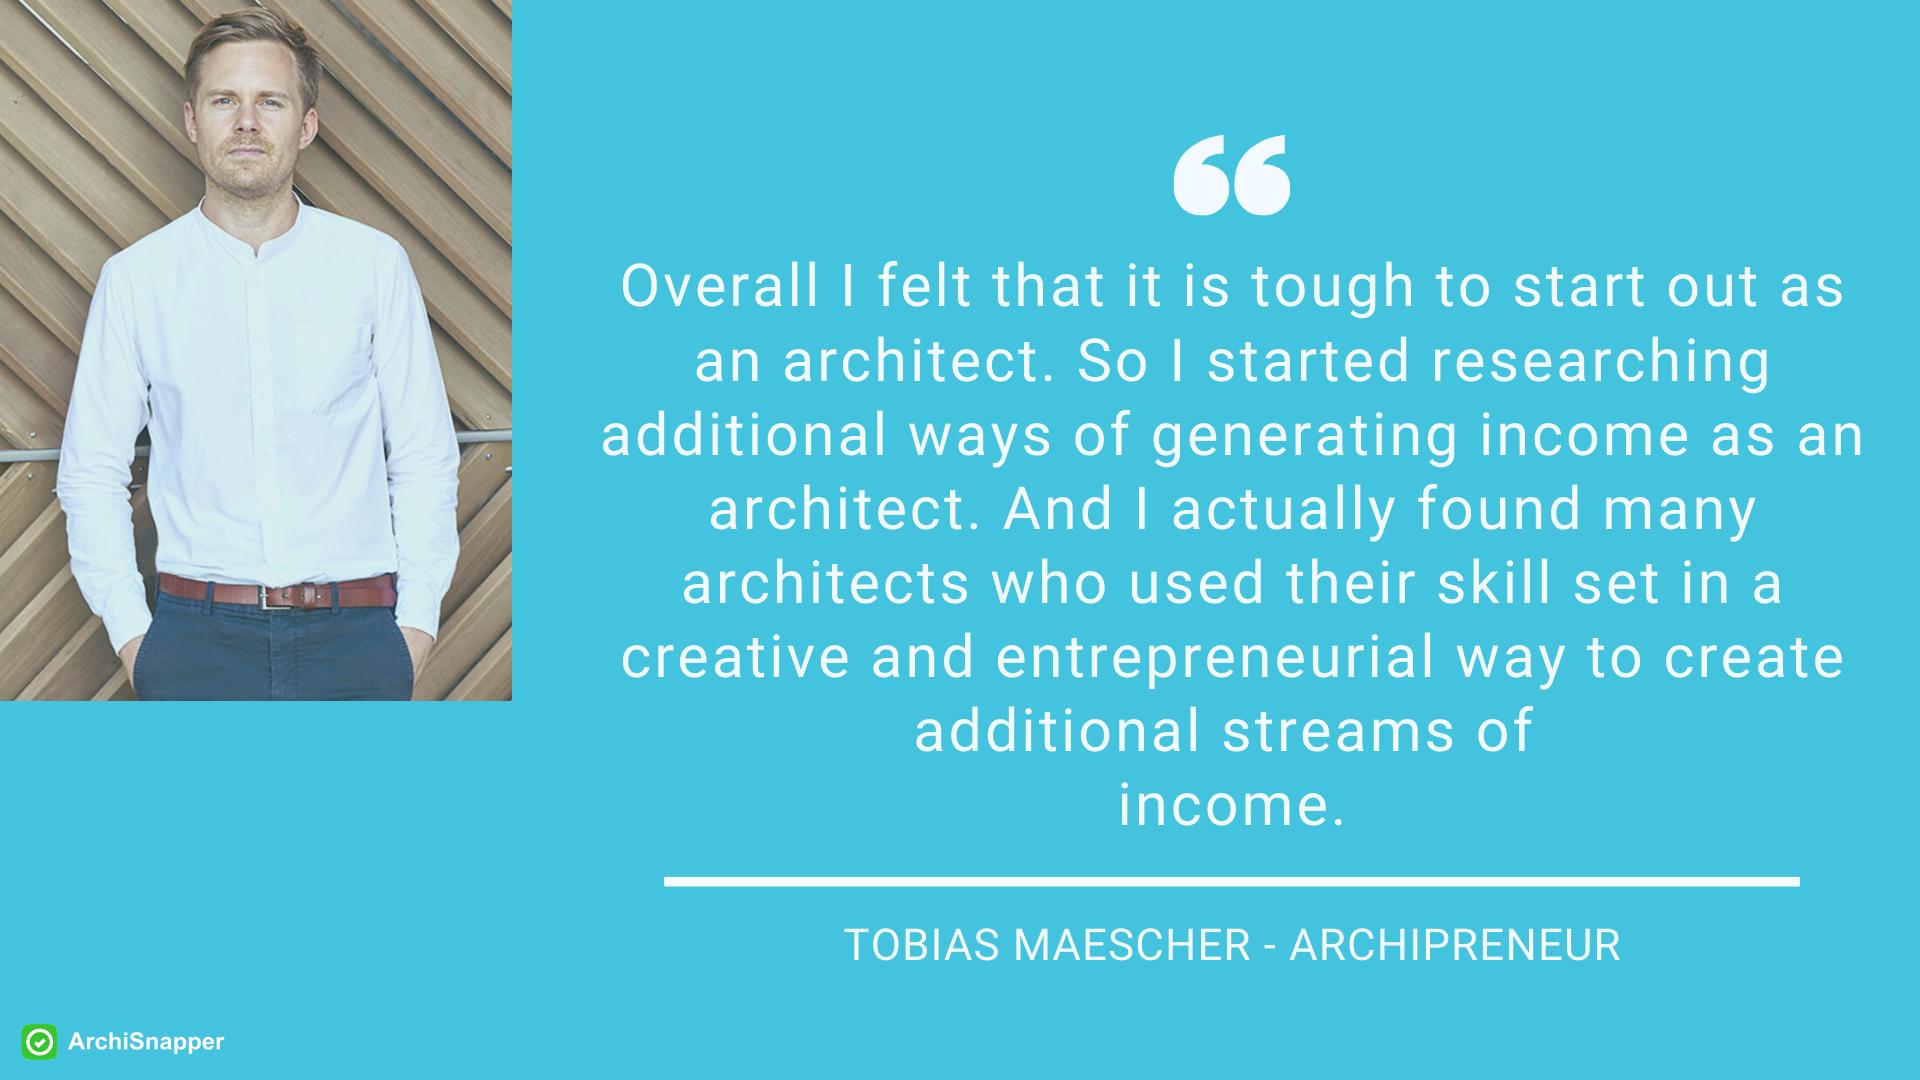 Tobias Maescher - Archipreneur | ArchiSnapper